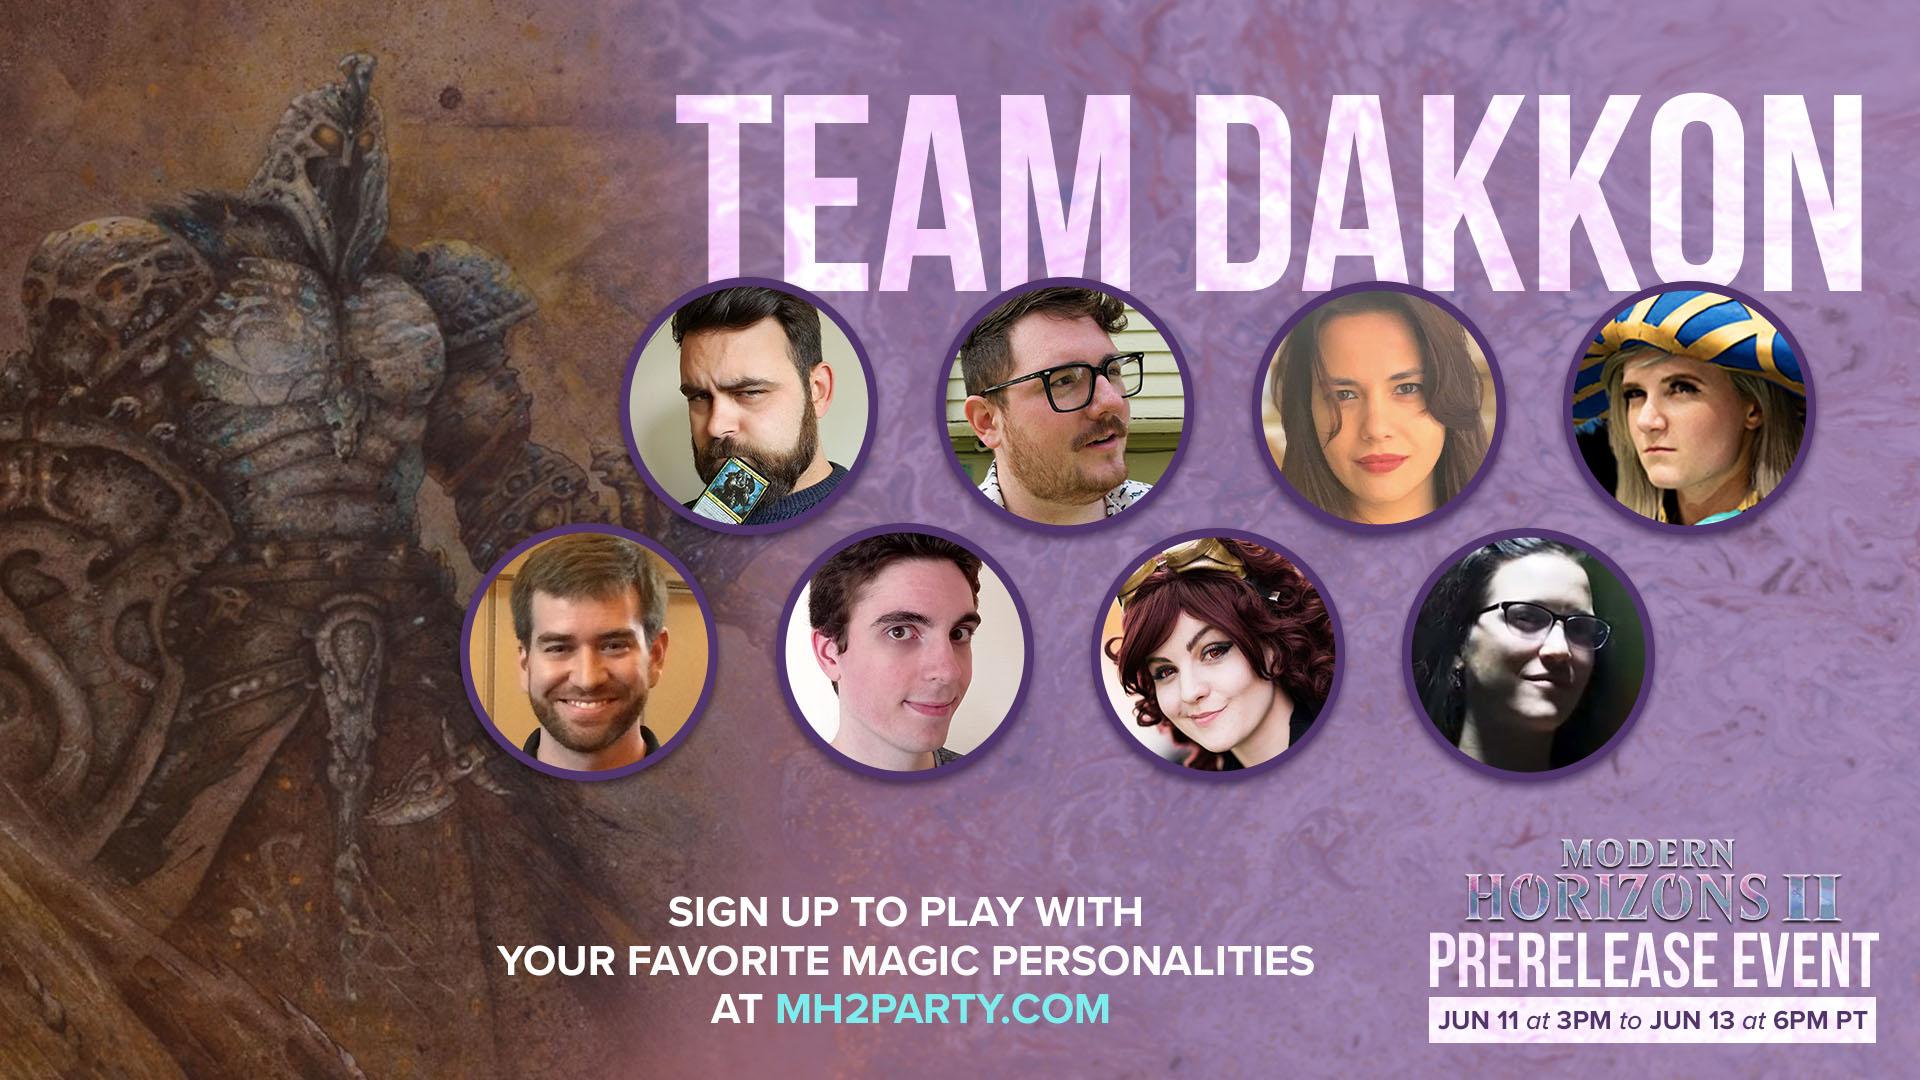 Team Dakkon members